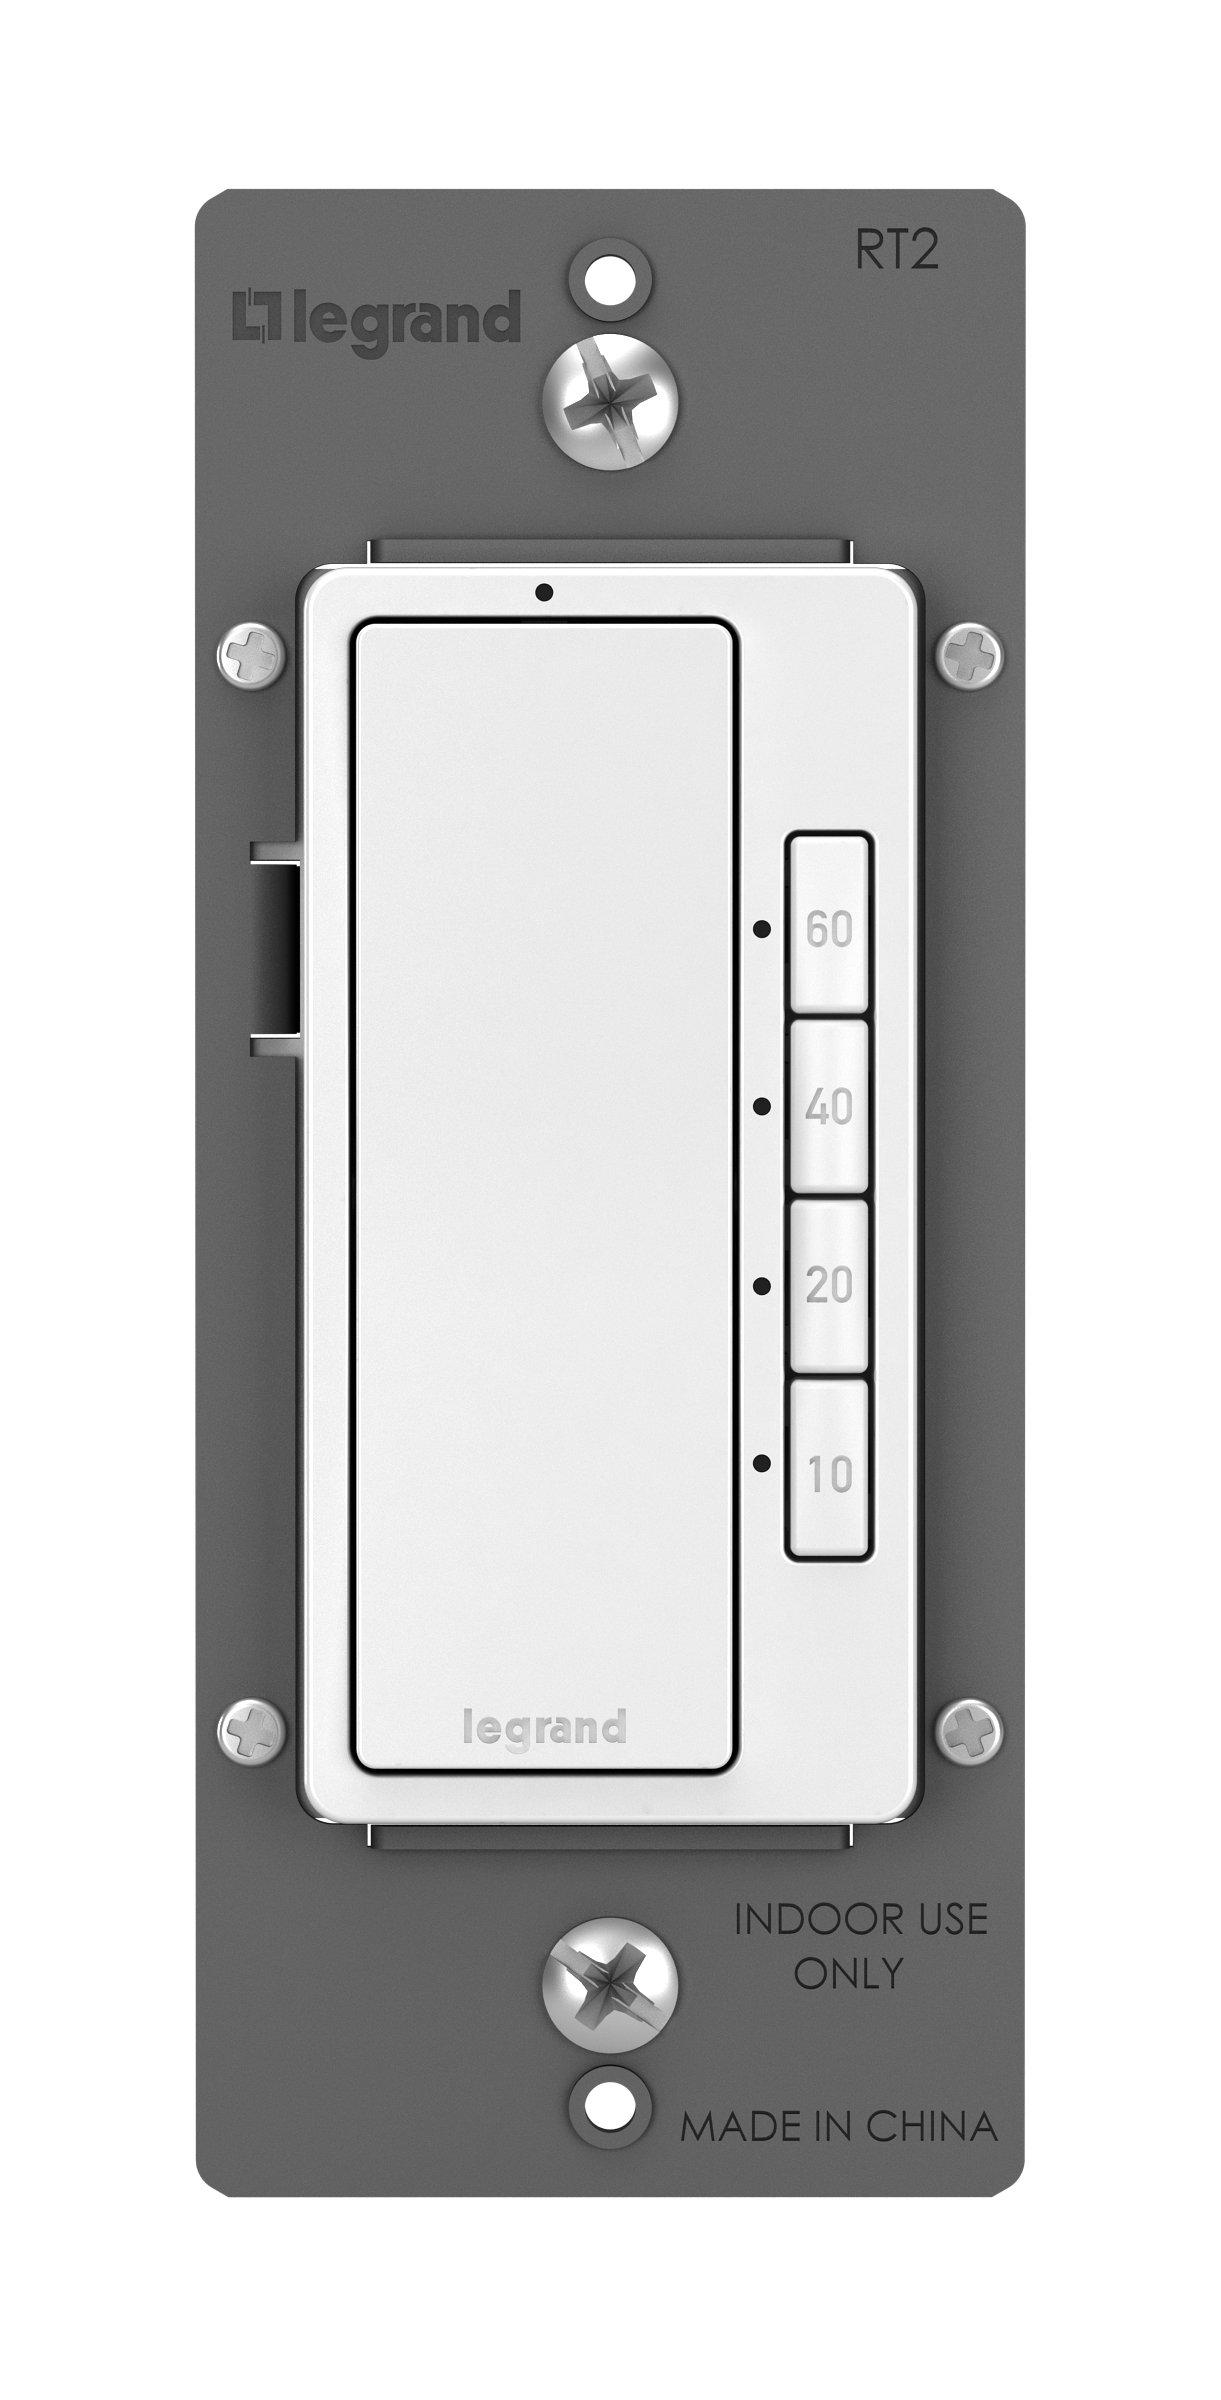 Legrand - Pass & Seymour radiant RT2WCCV4 Digital Timer Paddle Switch, White